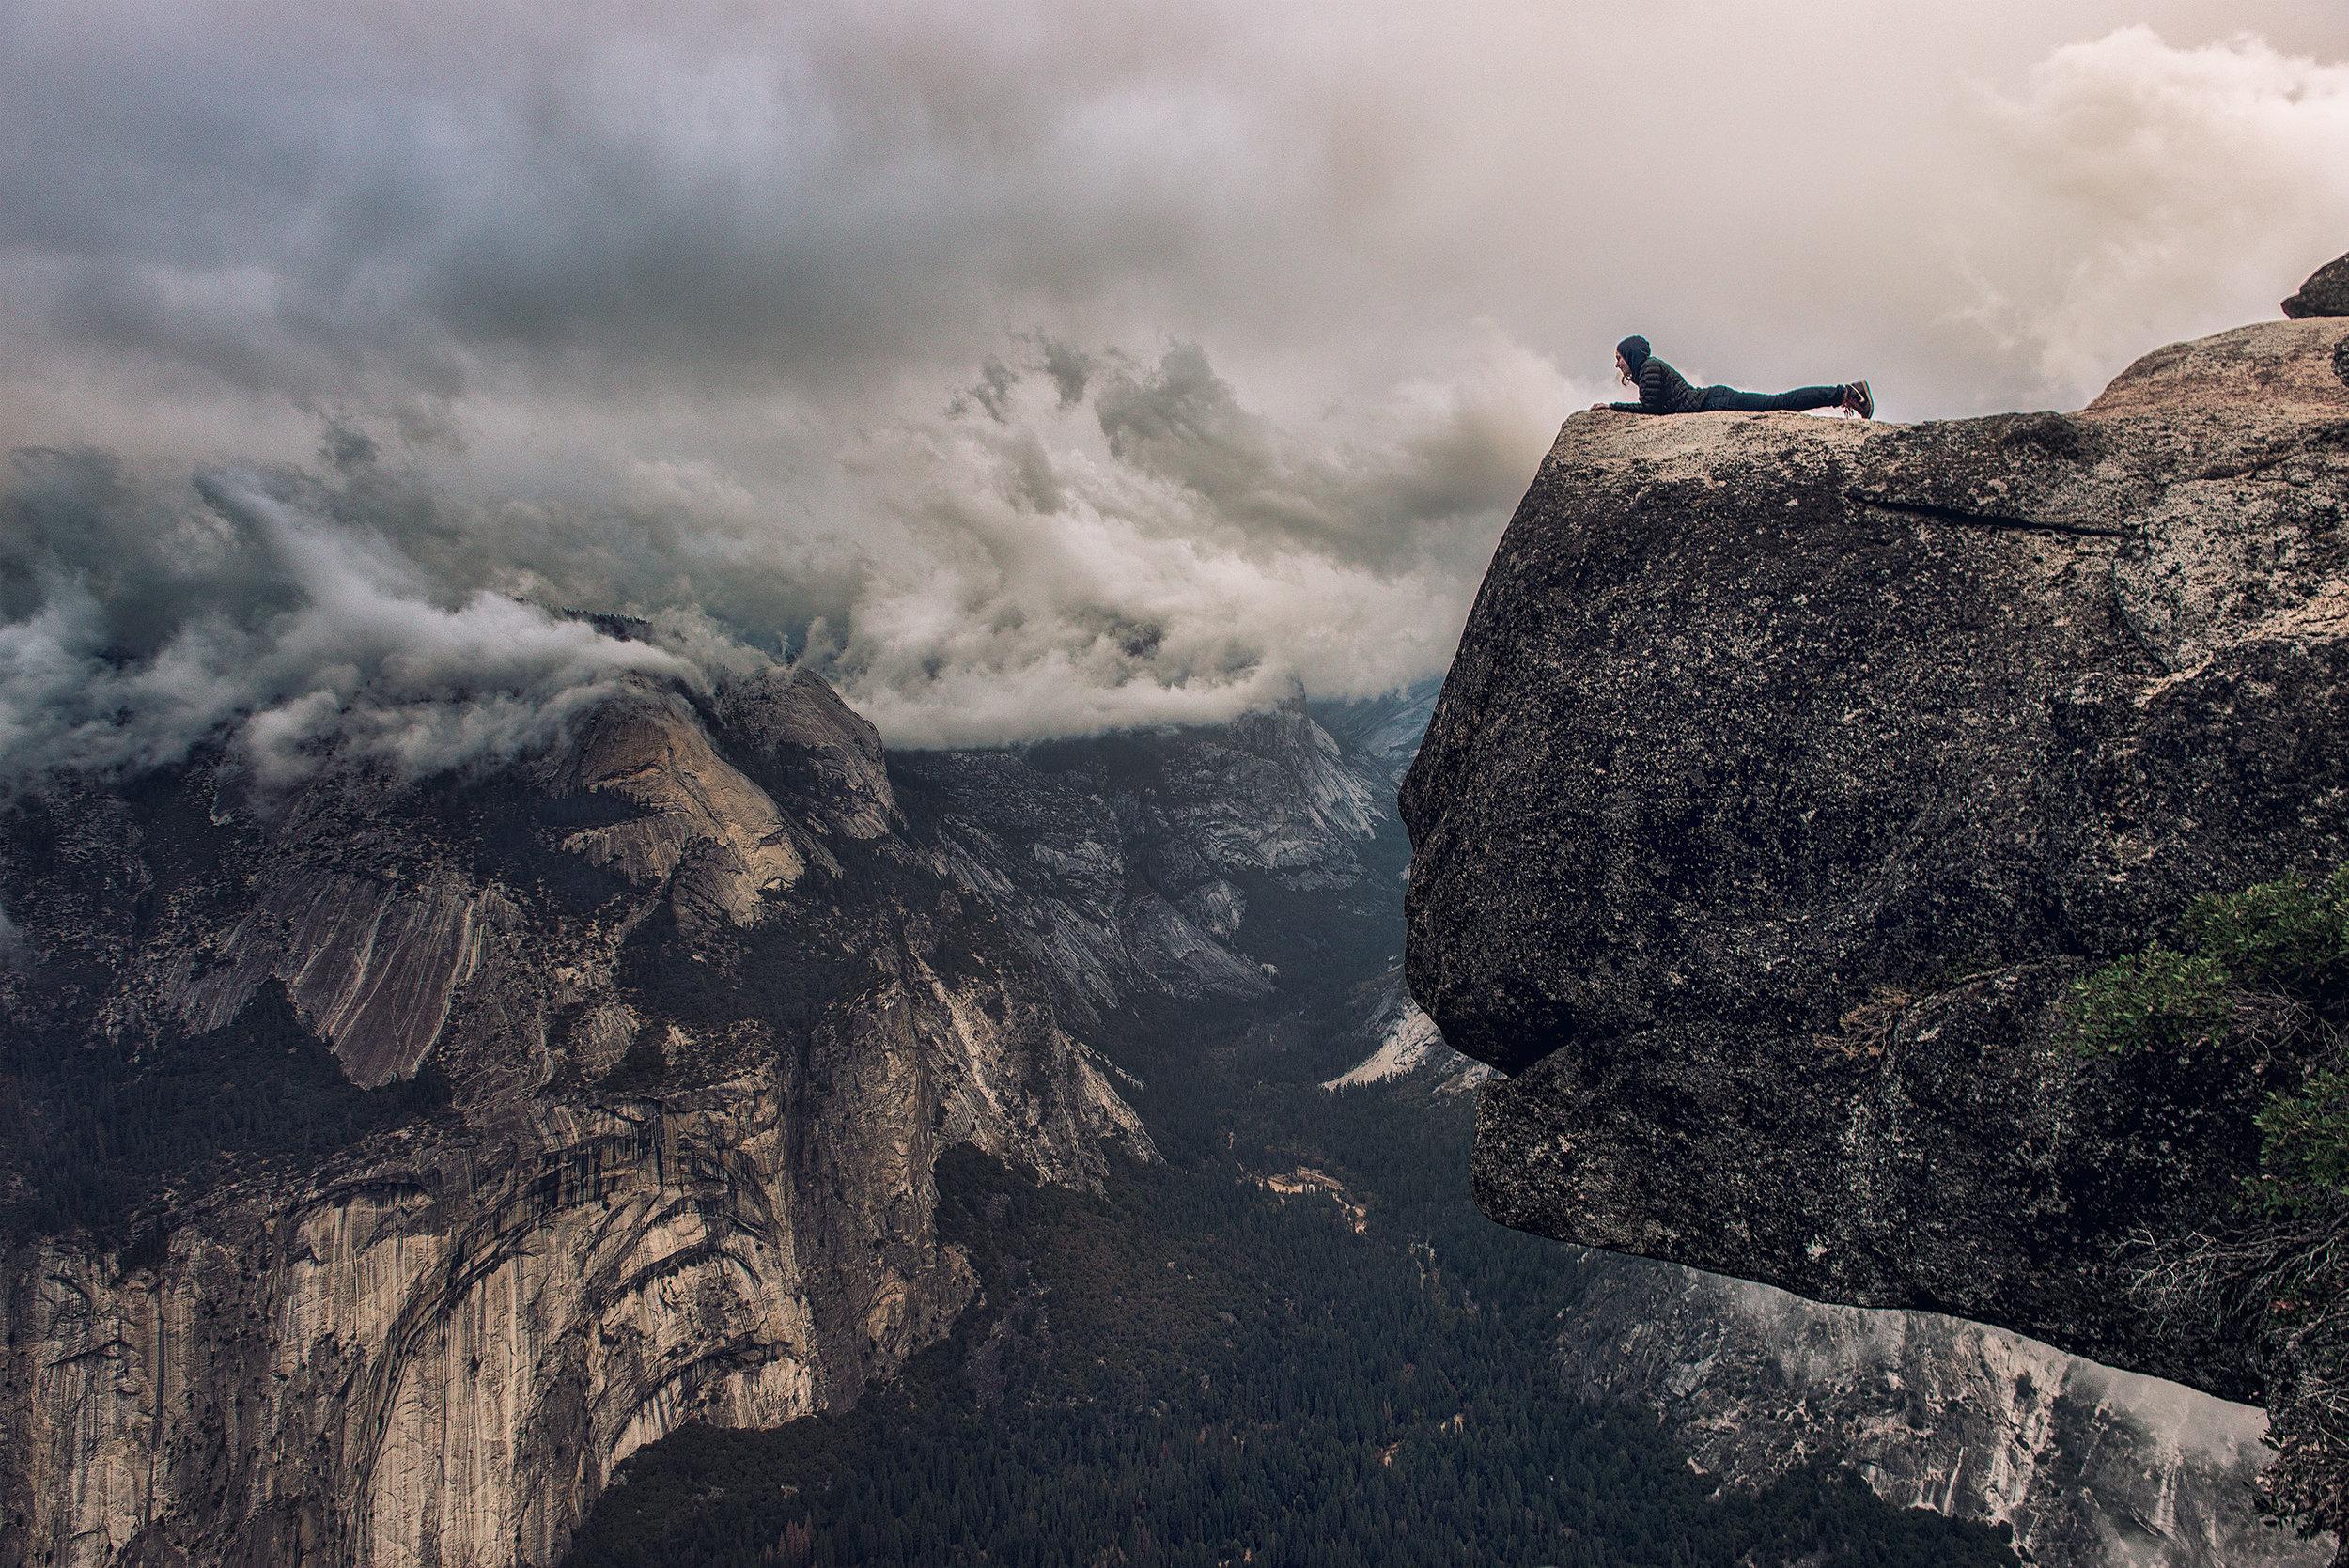 austin-trigg-joshua-tree-national-park-california-cliff-hanging-clouds-california-adventure-valley.jpg